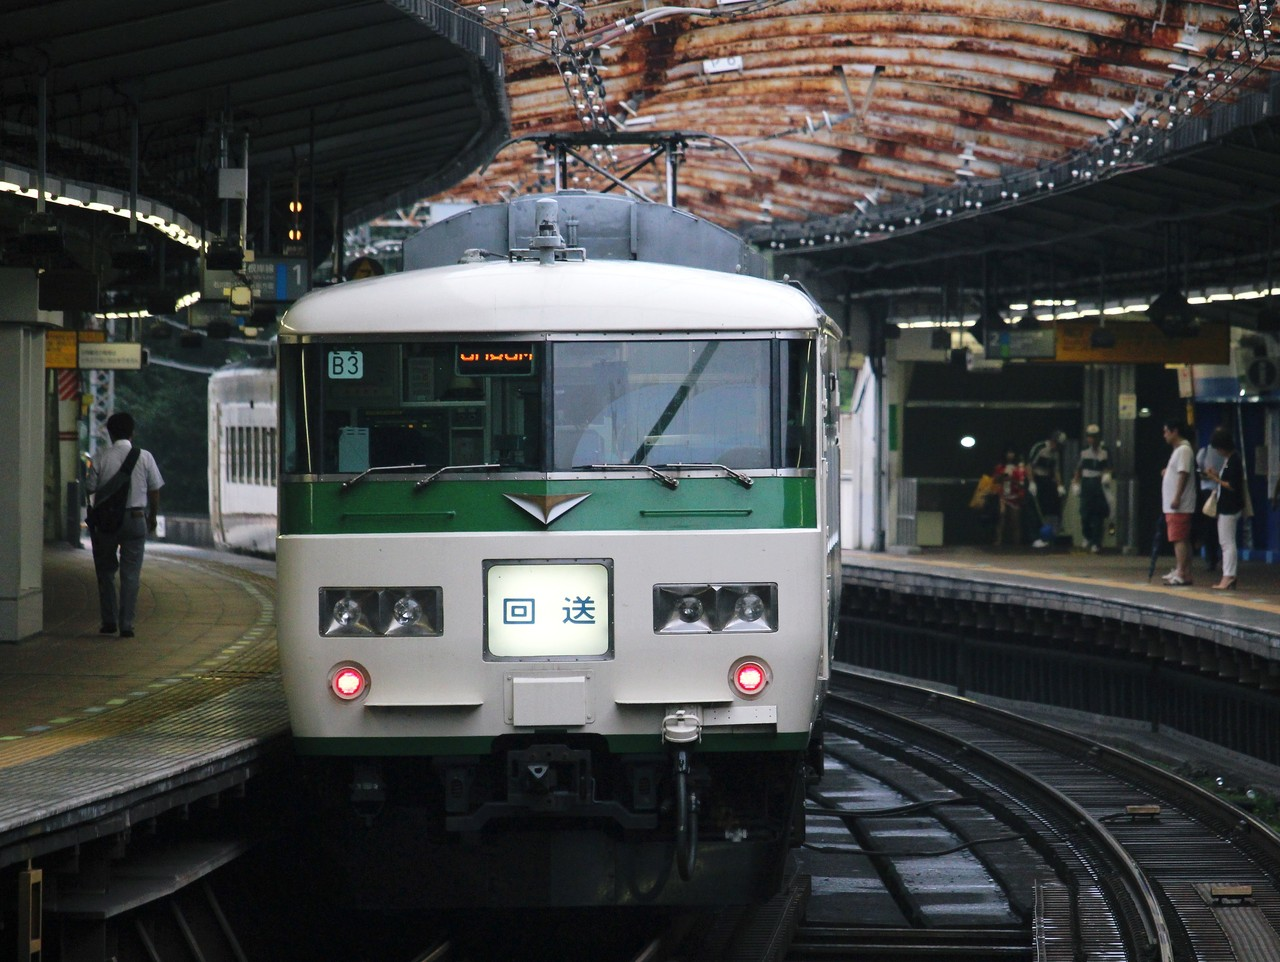 http://livedoor.blogimg.jp/shin_tsurumi/imgs/f/6/f65b8d47.jpg